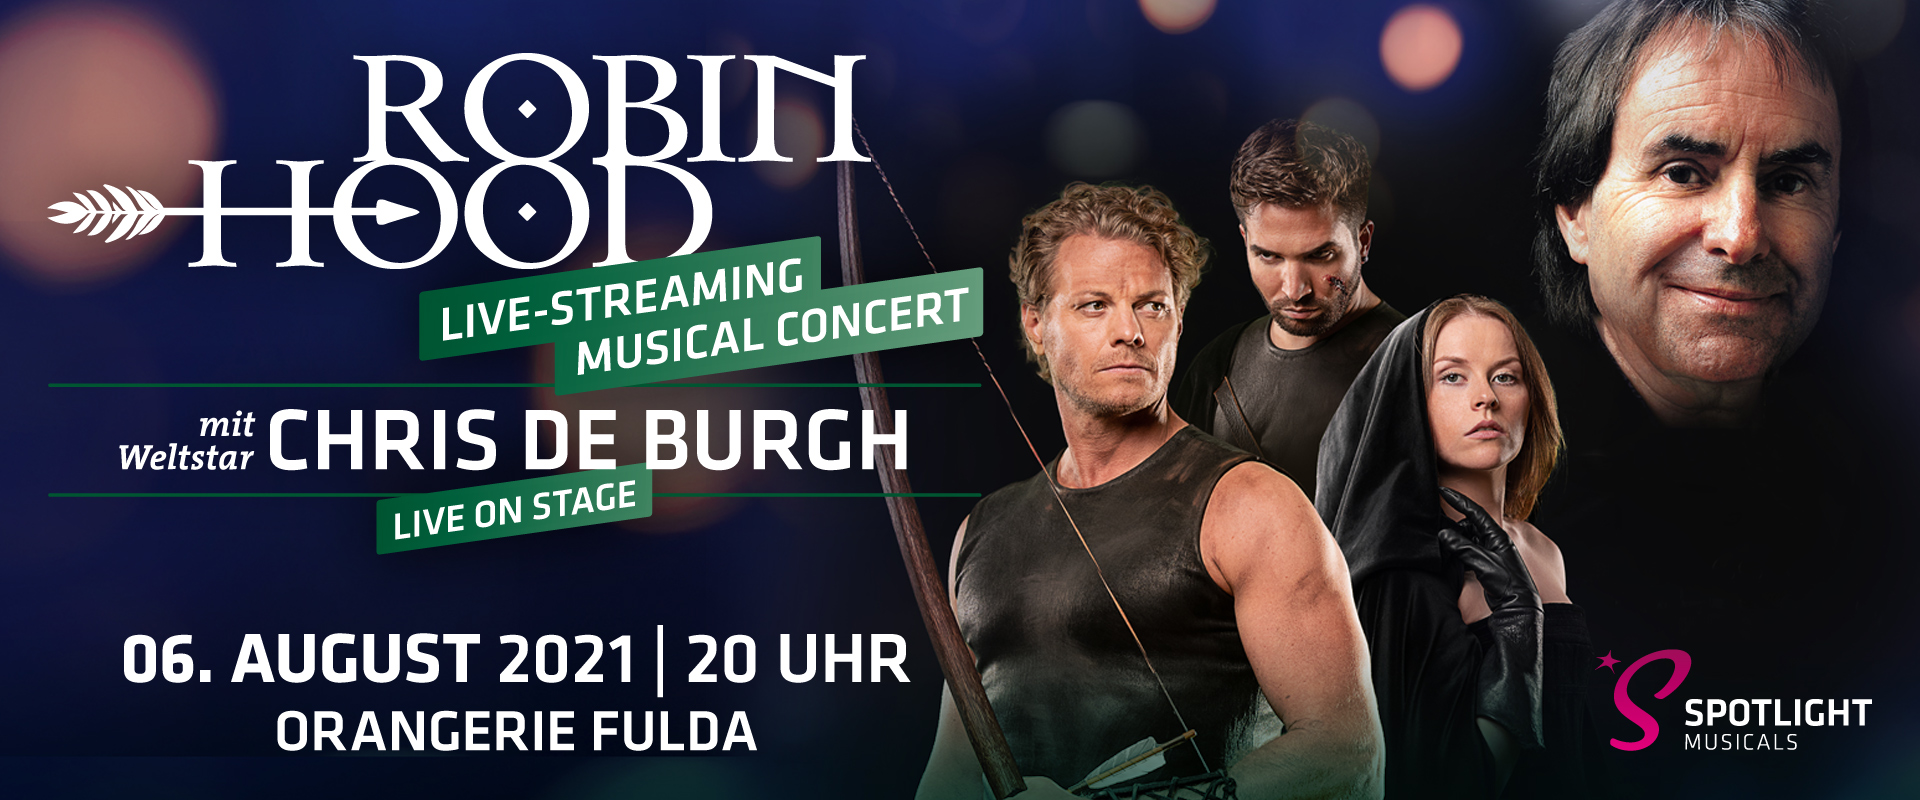 Robin Hood Live-Streaming Musical Concert mit Chris de Burgh